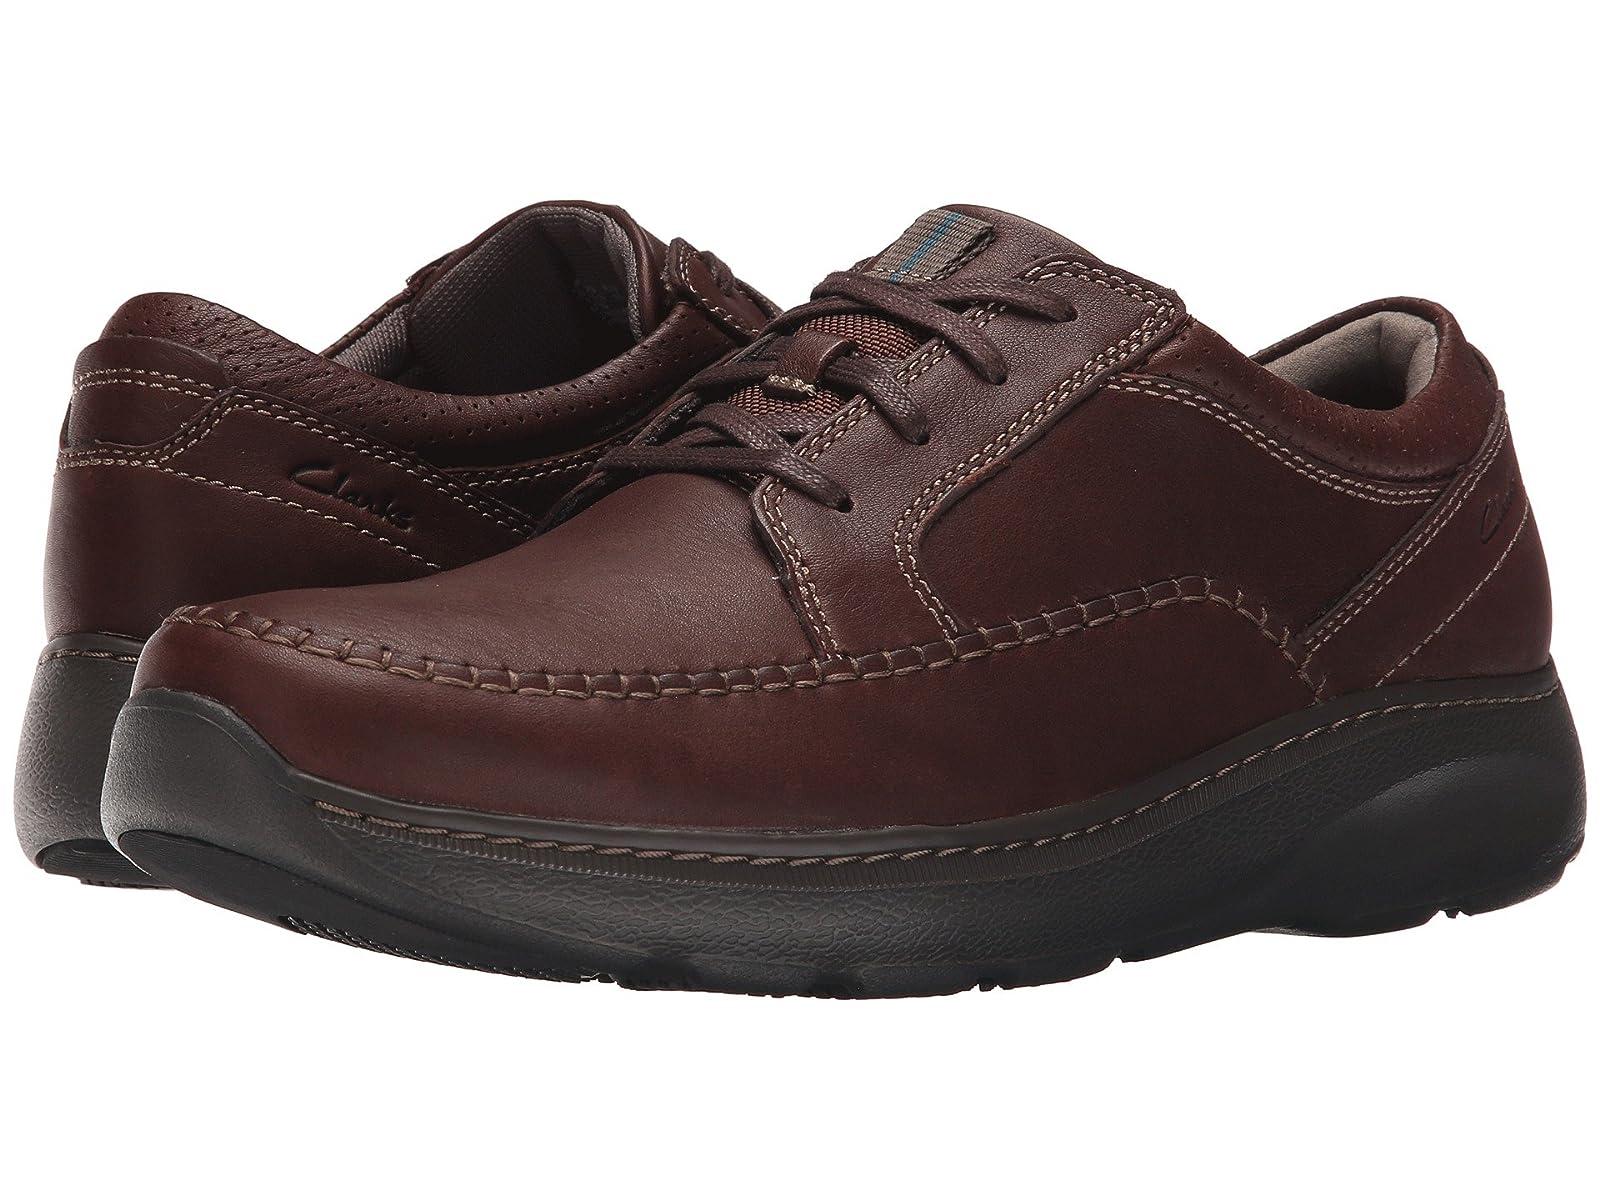 Clarks Charton VibeAtmospheric grades have affordable shoes